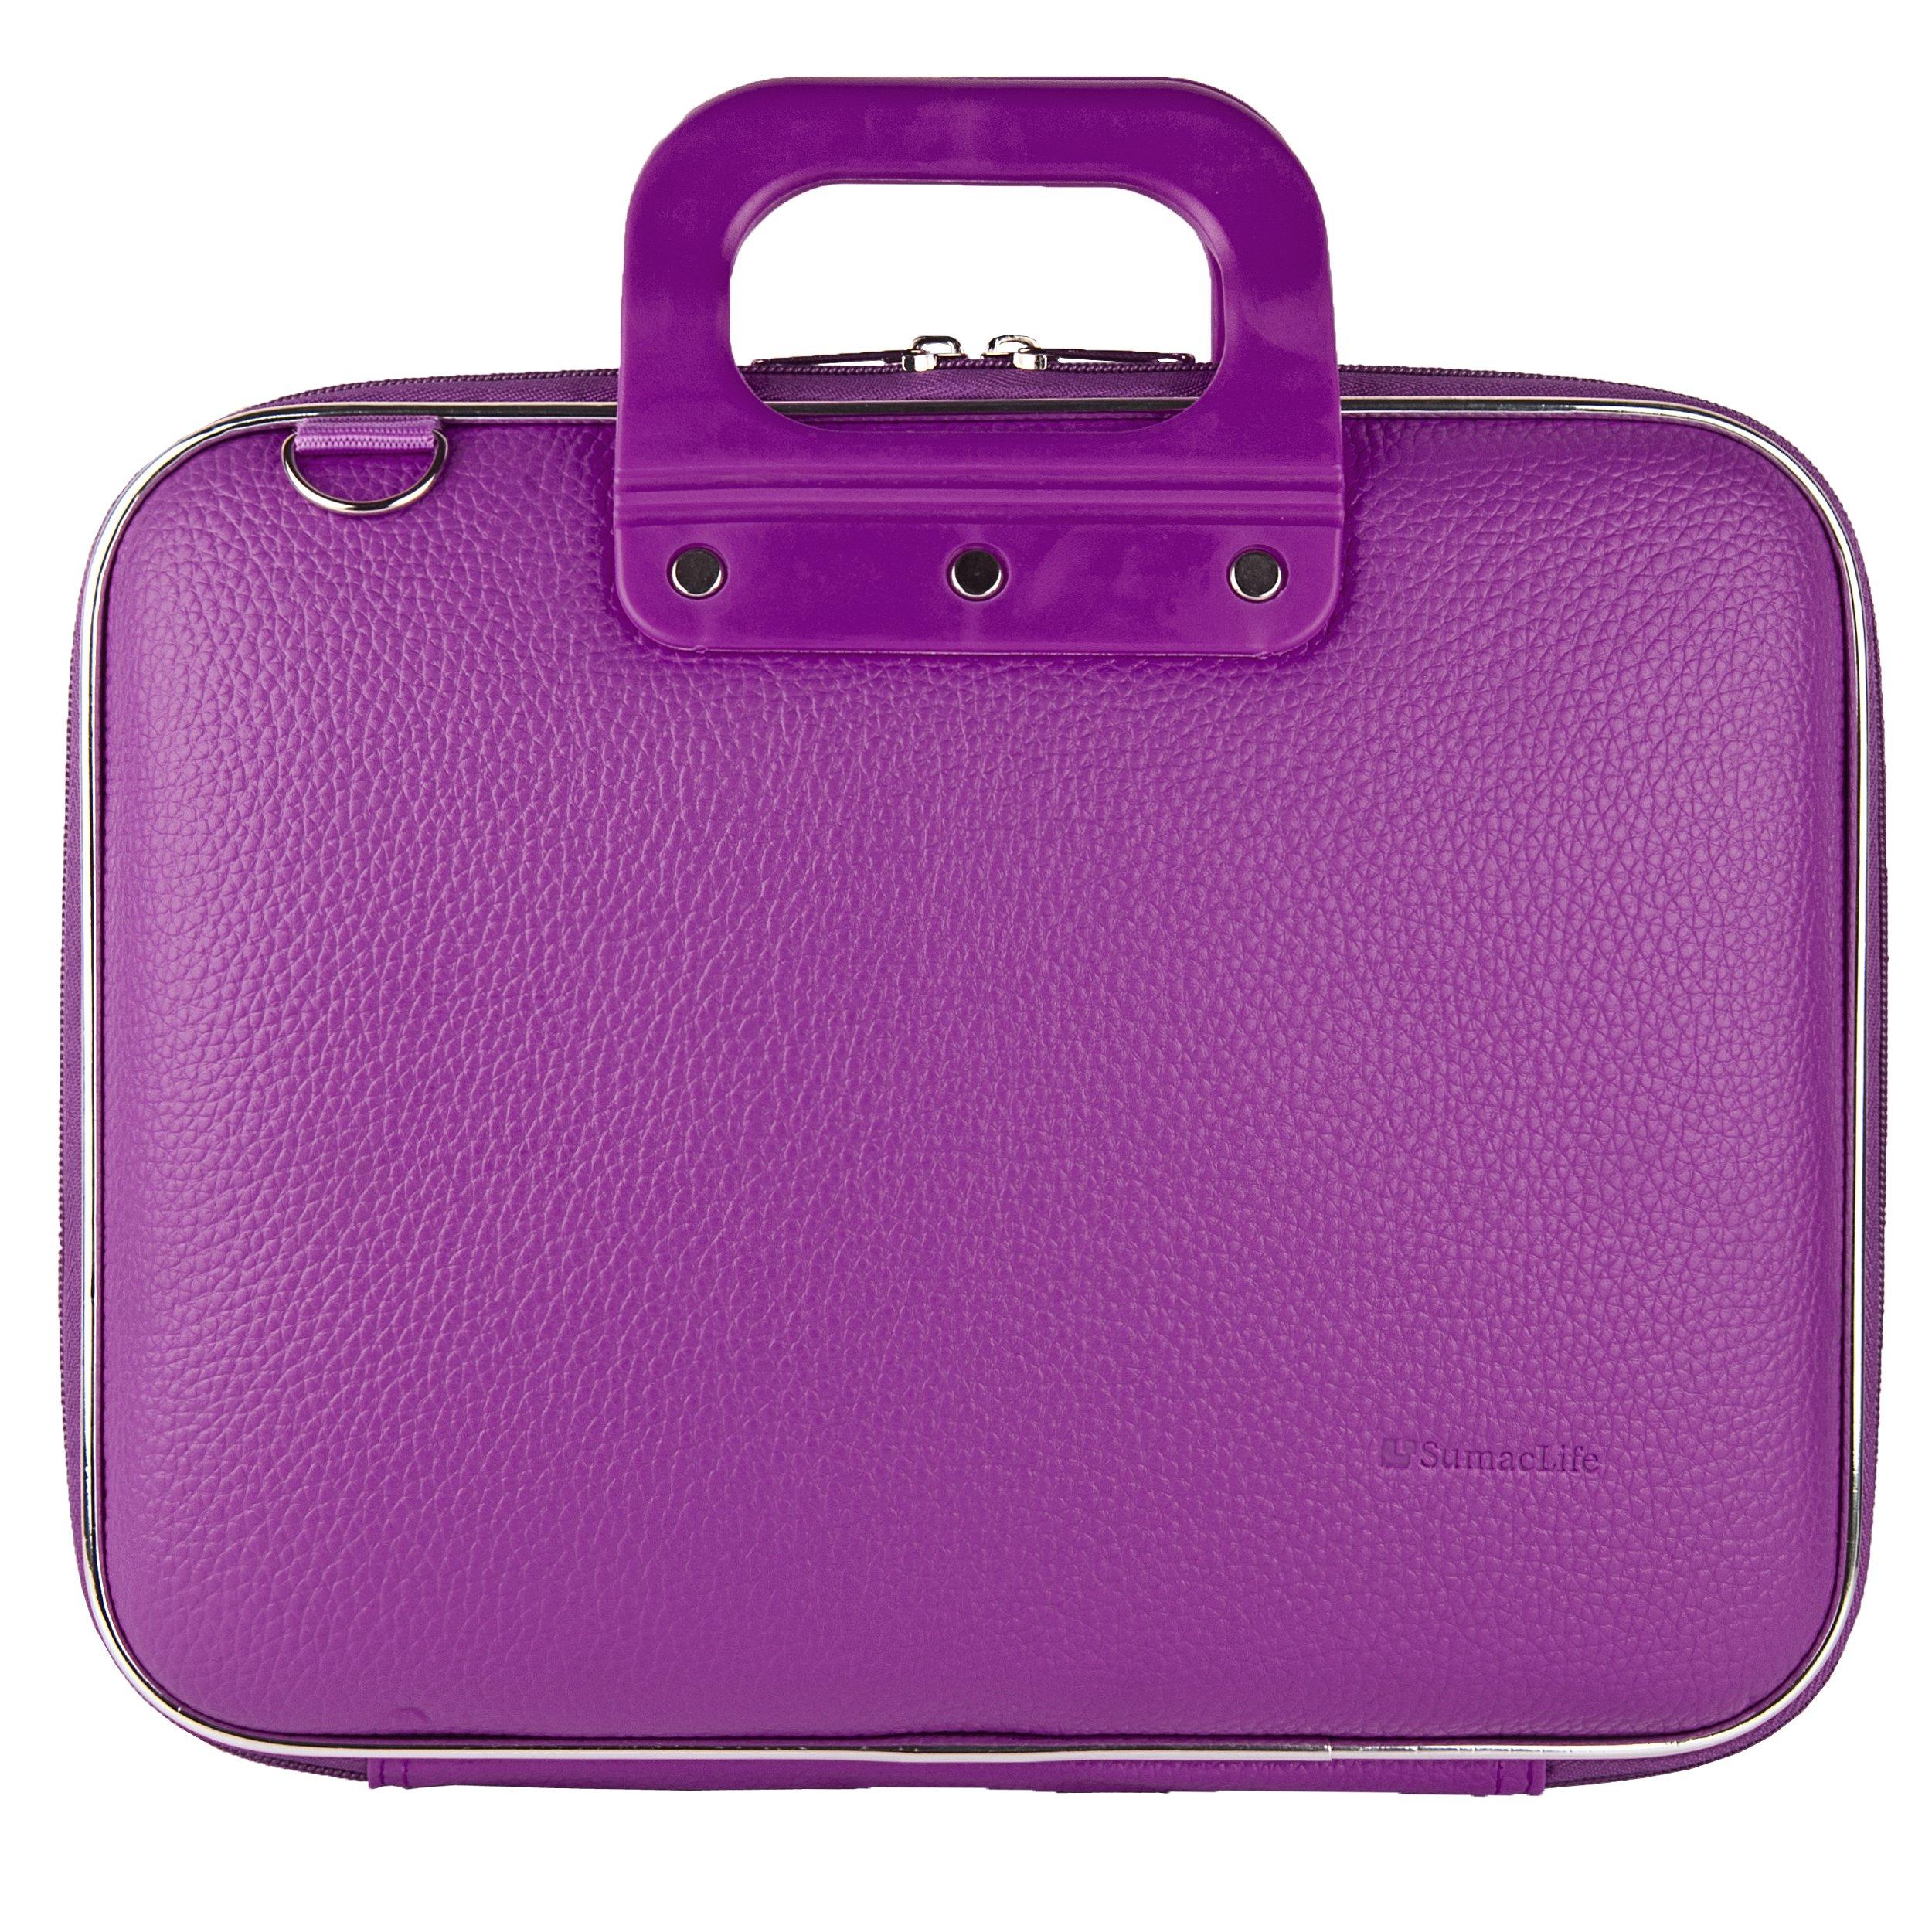 Lylic Shoulder Bag Briefcase for Sylvania 10-Inch/9 Inch Swivel Screen Portable DVD/CD/MP3 Player